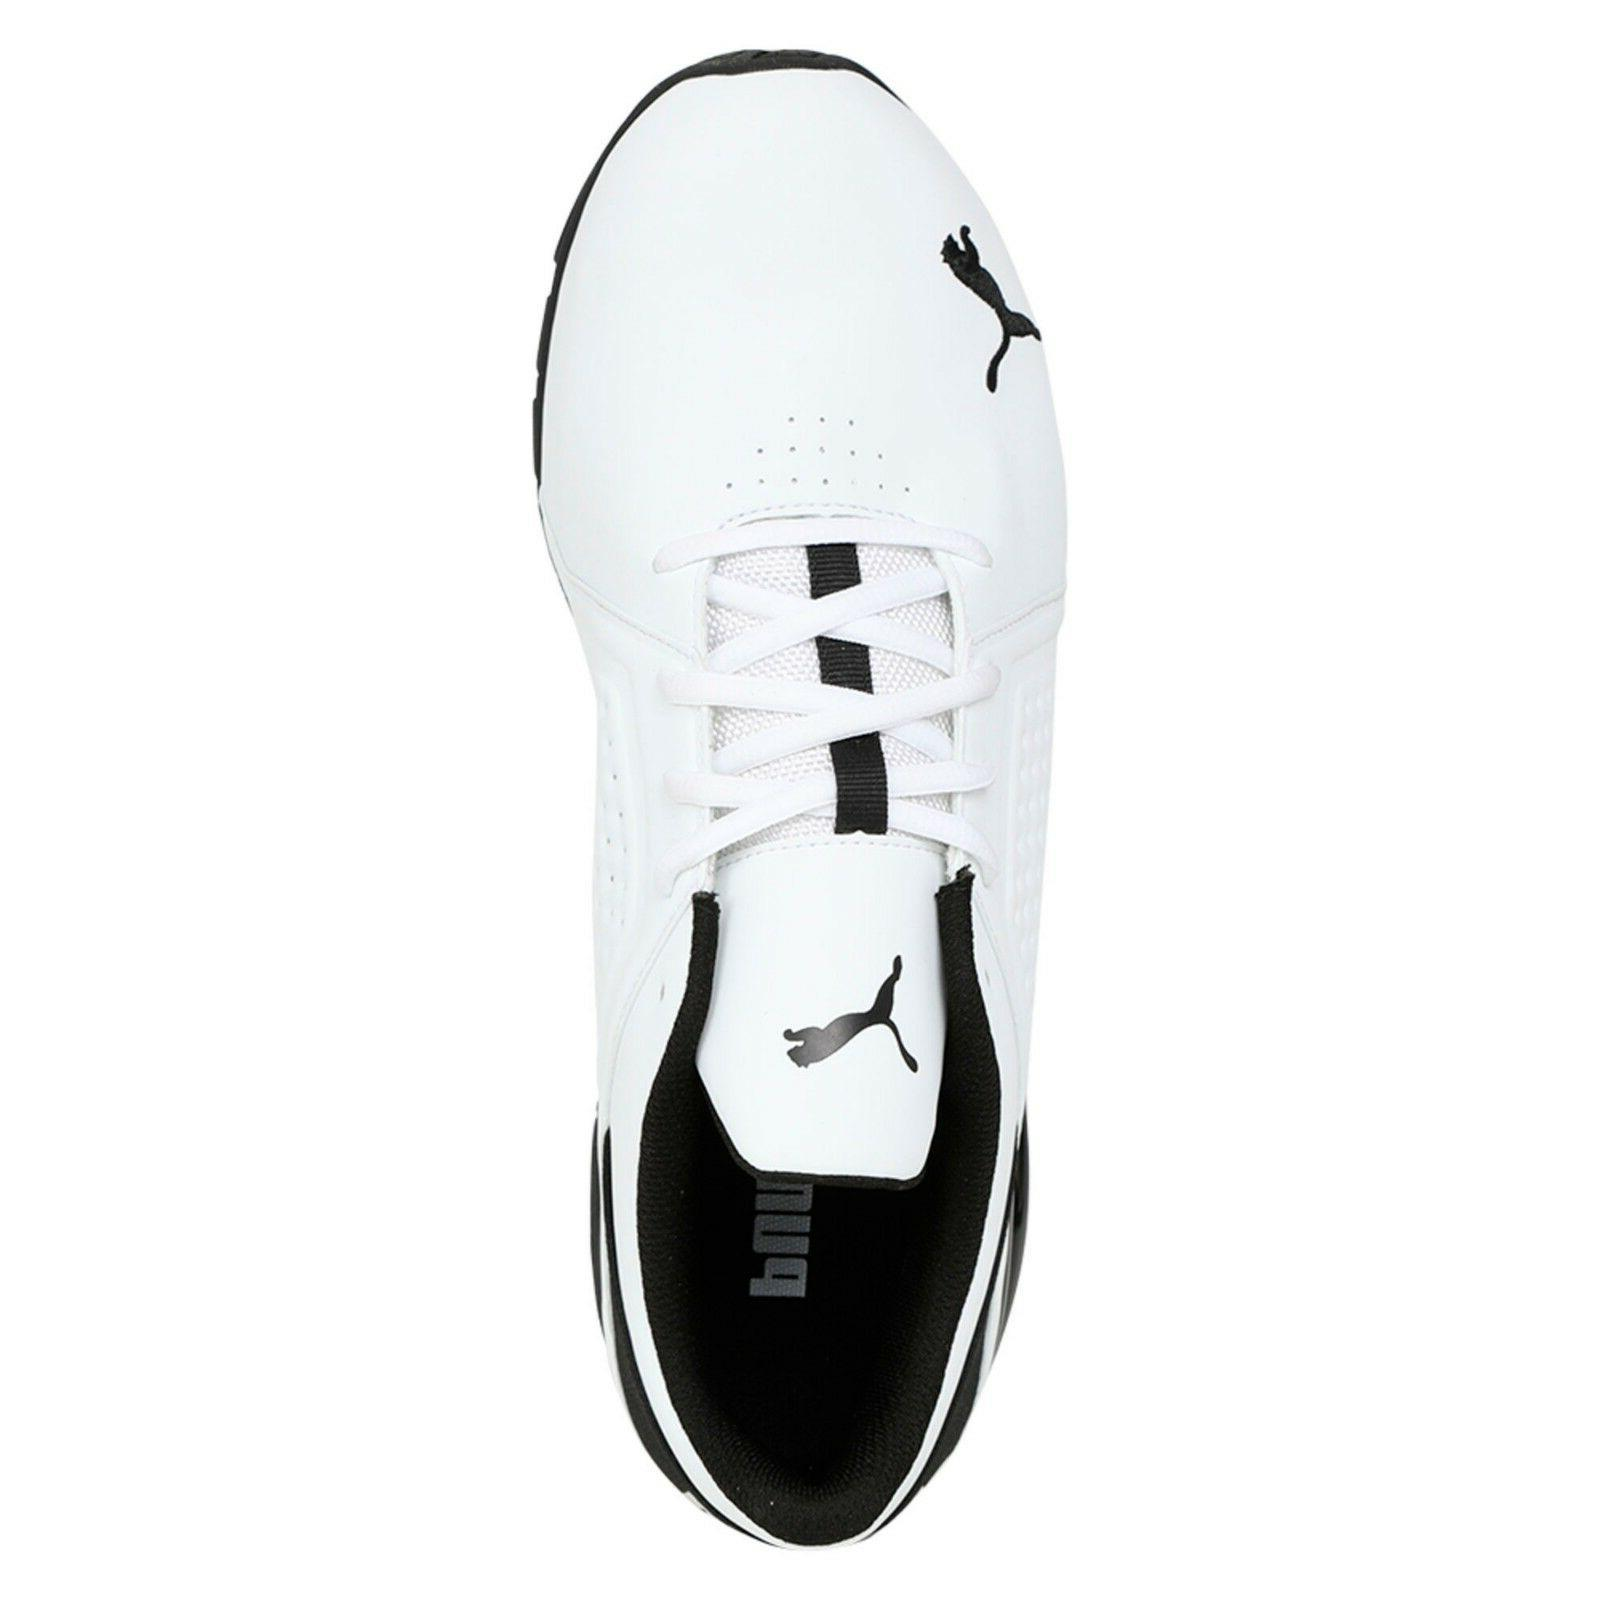 New Puma Runner men's running shoes white